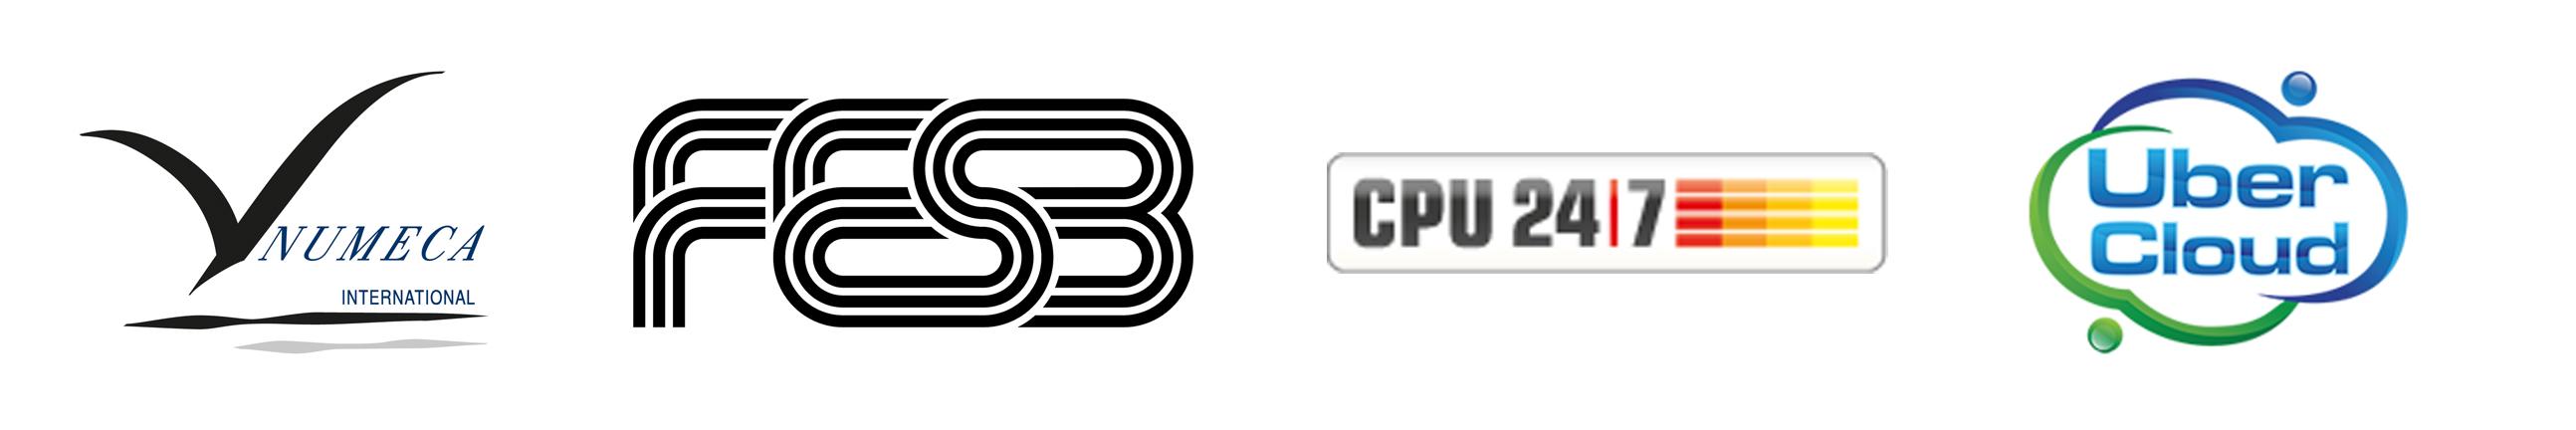 Logos Numeca FESB CPU247 Ubercloud